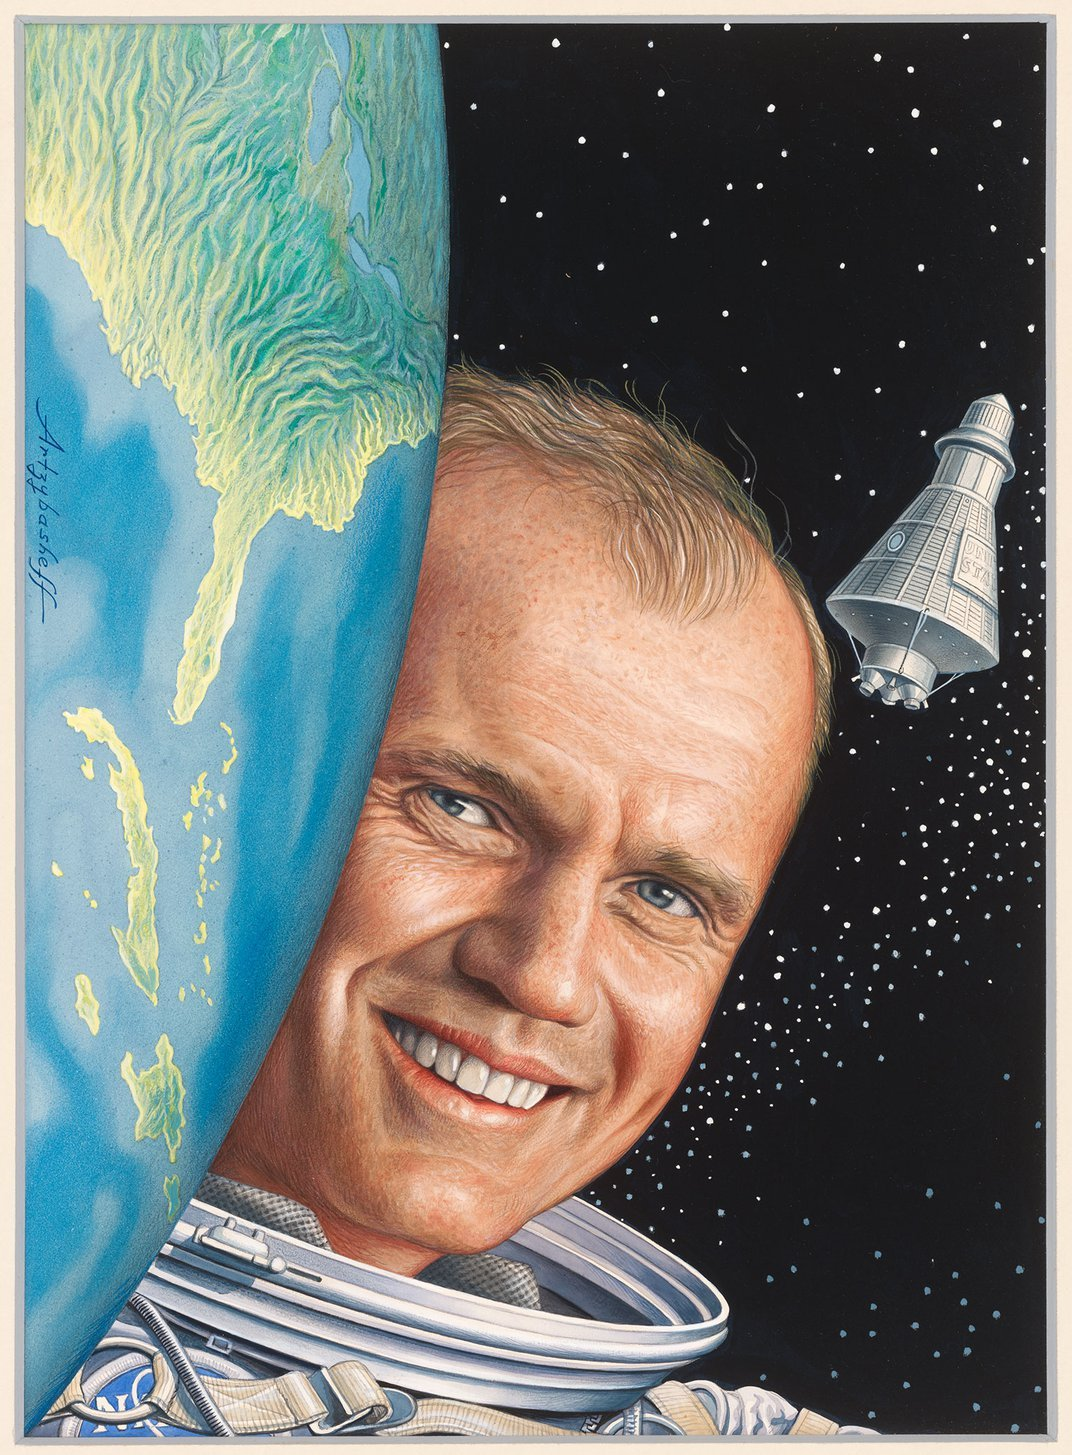 How John Glenn's Encore Space Flight Lifted U.S. Spirits